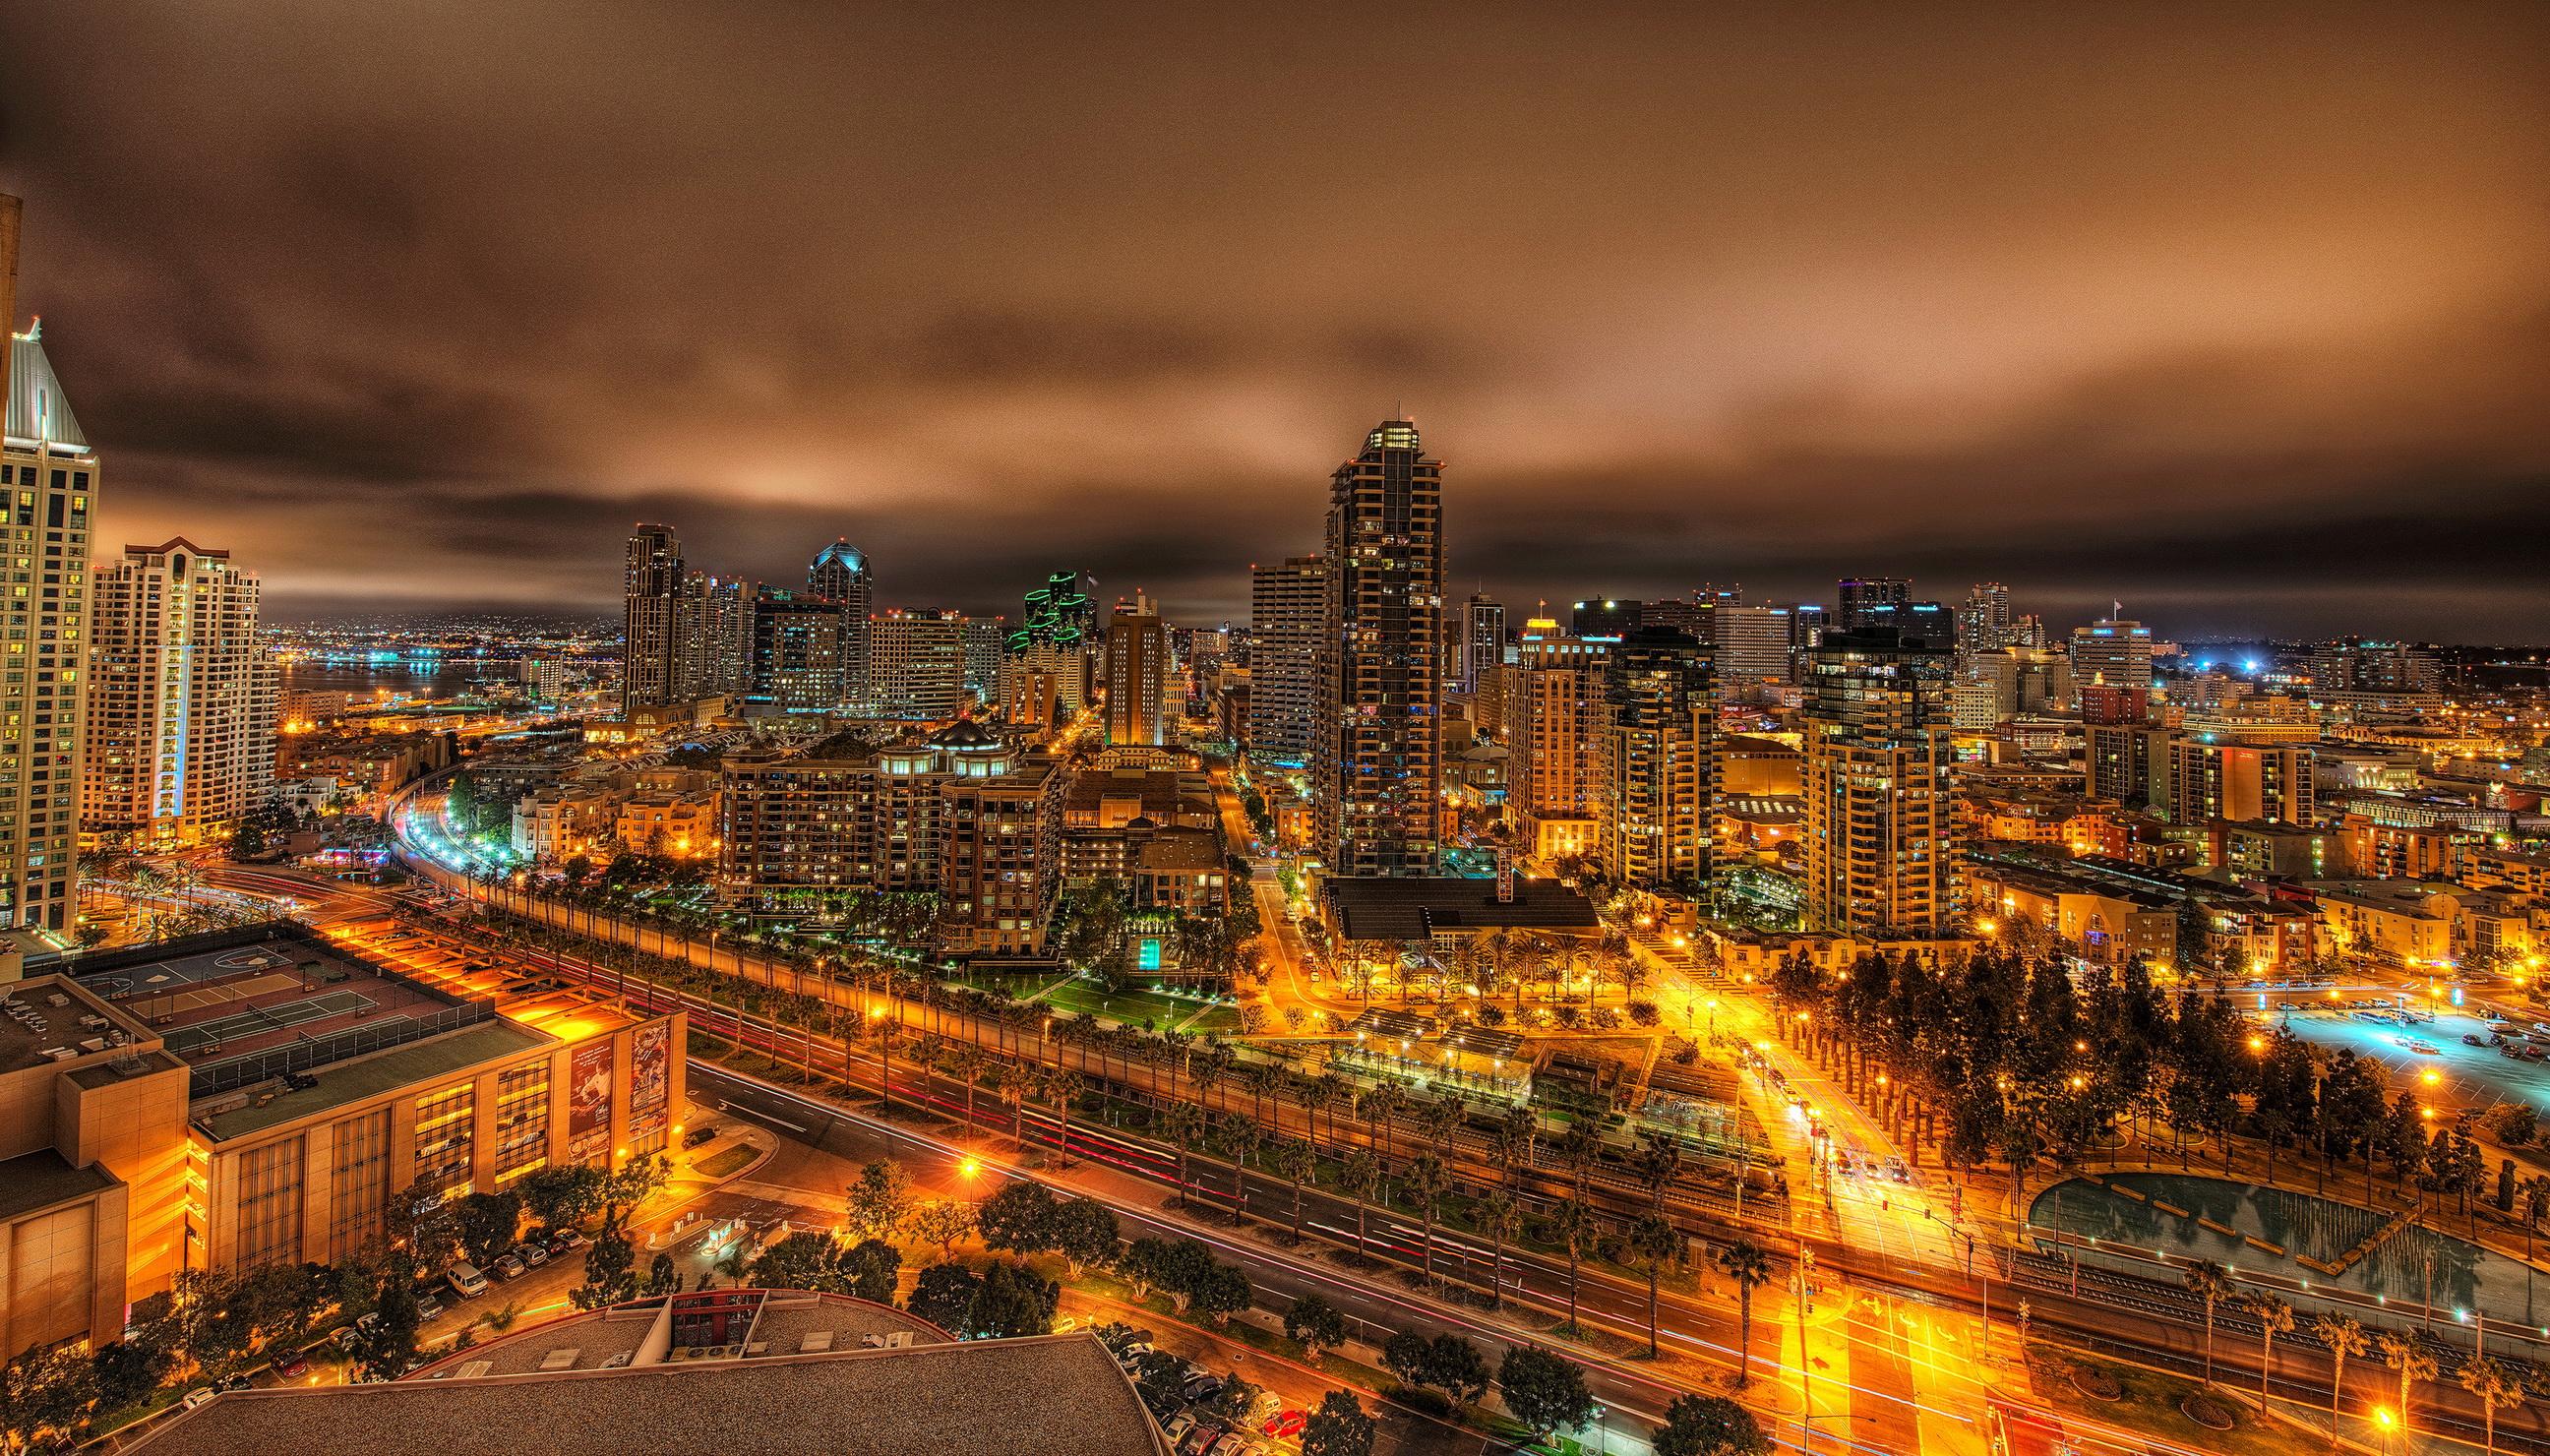 страны архитектура Сан-Диего США country architecture San Diego USA загрузить